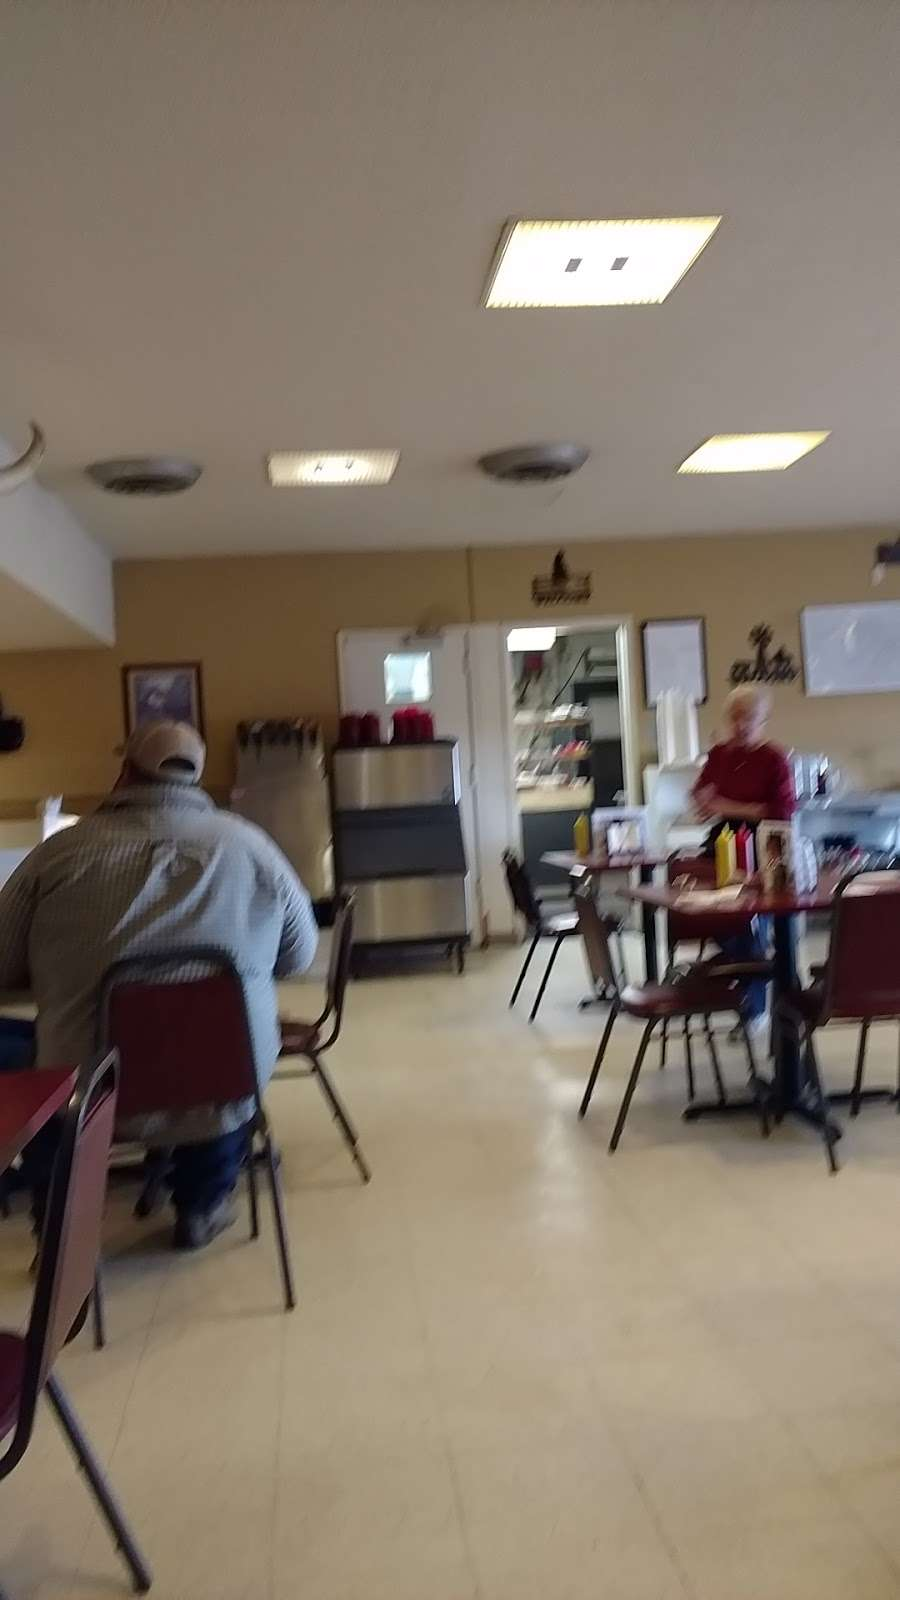 Stockman's Cafe - cafe  | Photo 6 of 10 | Address: 711 O St, Greeley, CO 80631, USA | Phone: (970) 353-4121